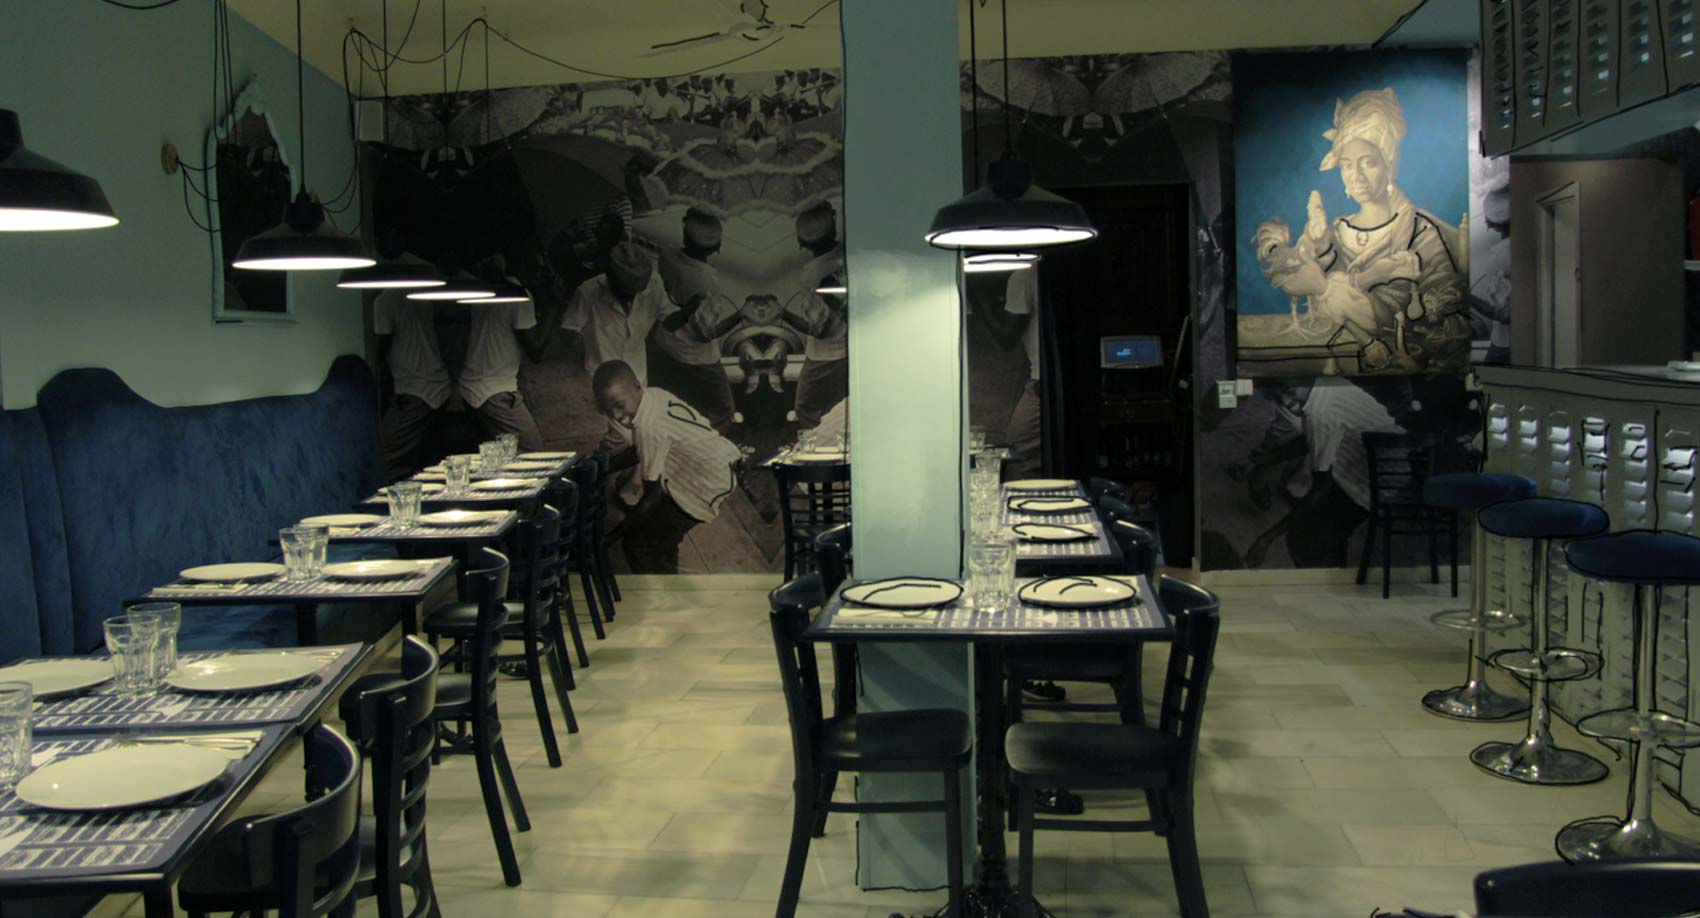 restaurante-gumbo-nueva-orleans-cajún-opiniones-slide-bg